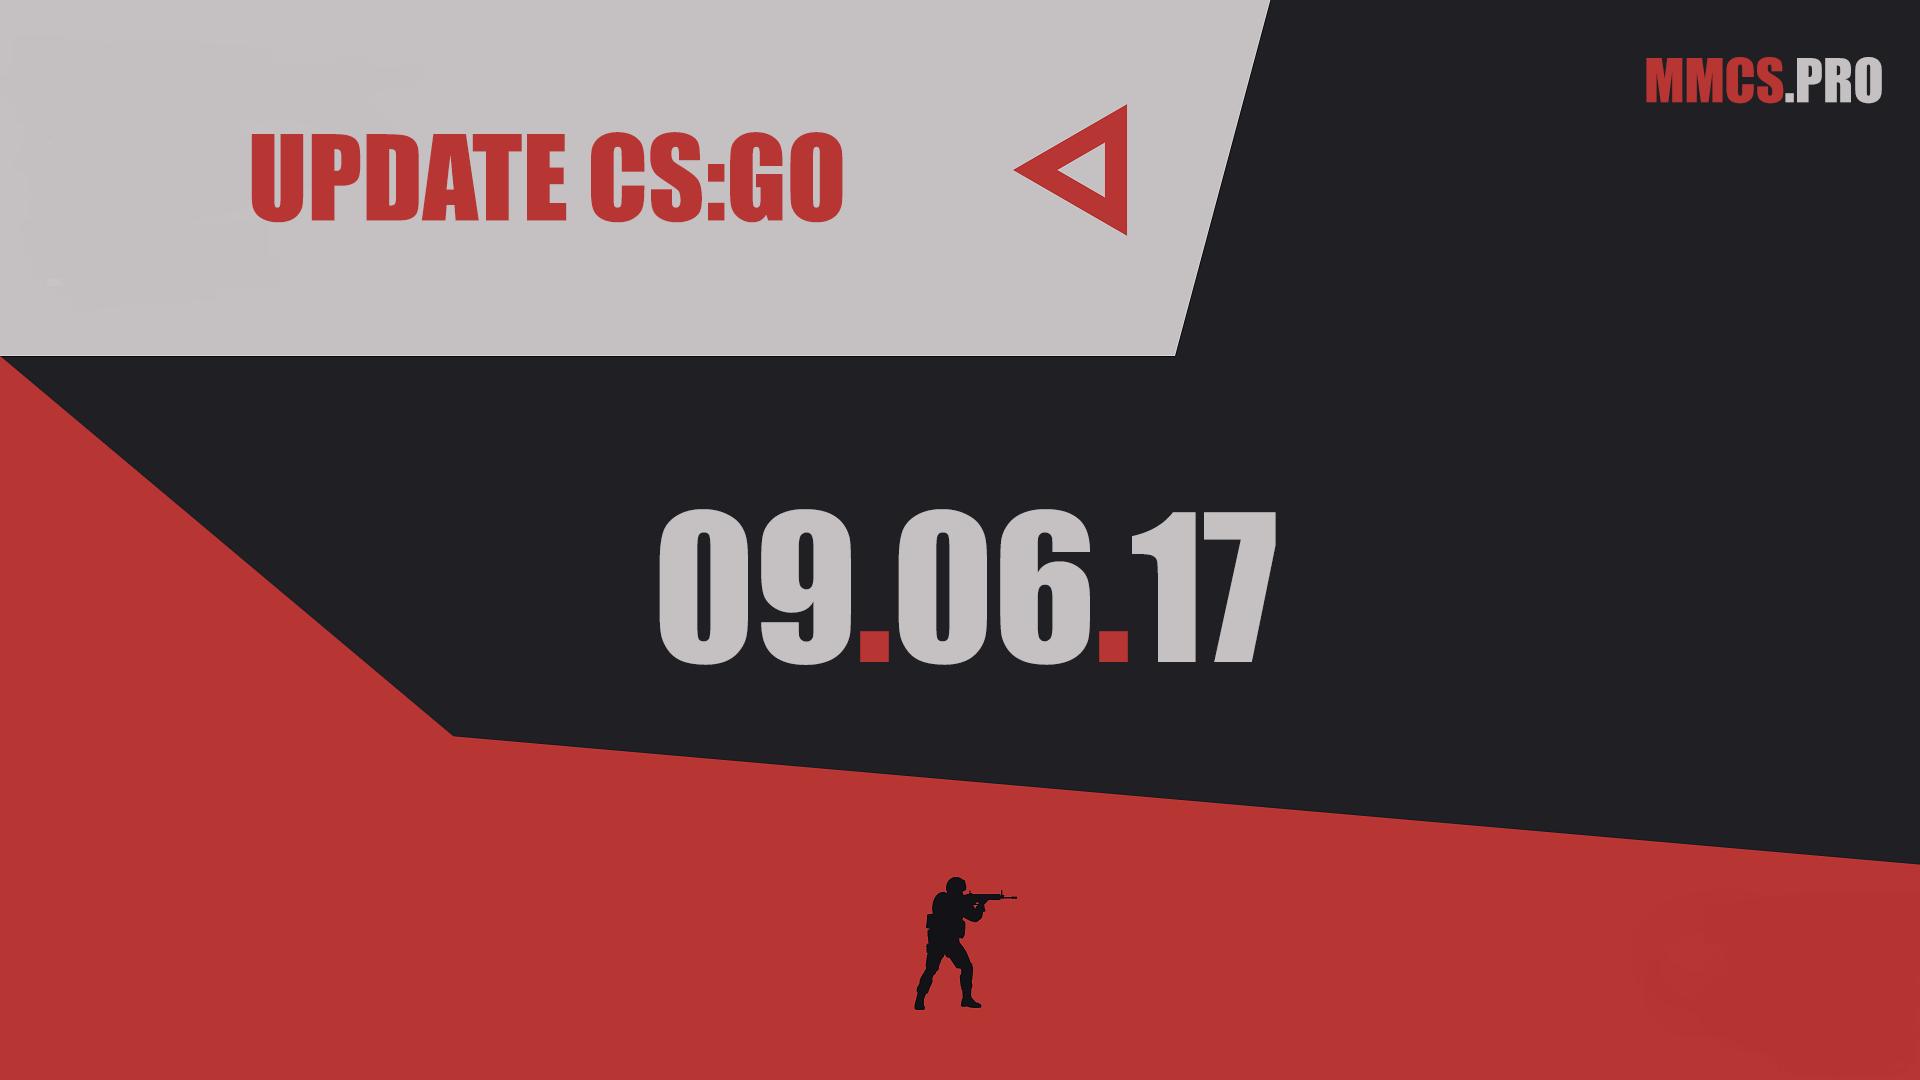 https://mmcs.pro/update-csgo-09-06-2017-valve/